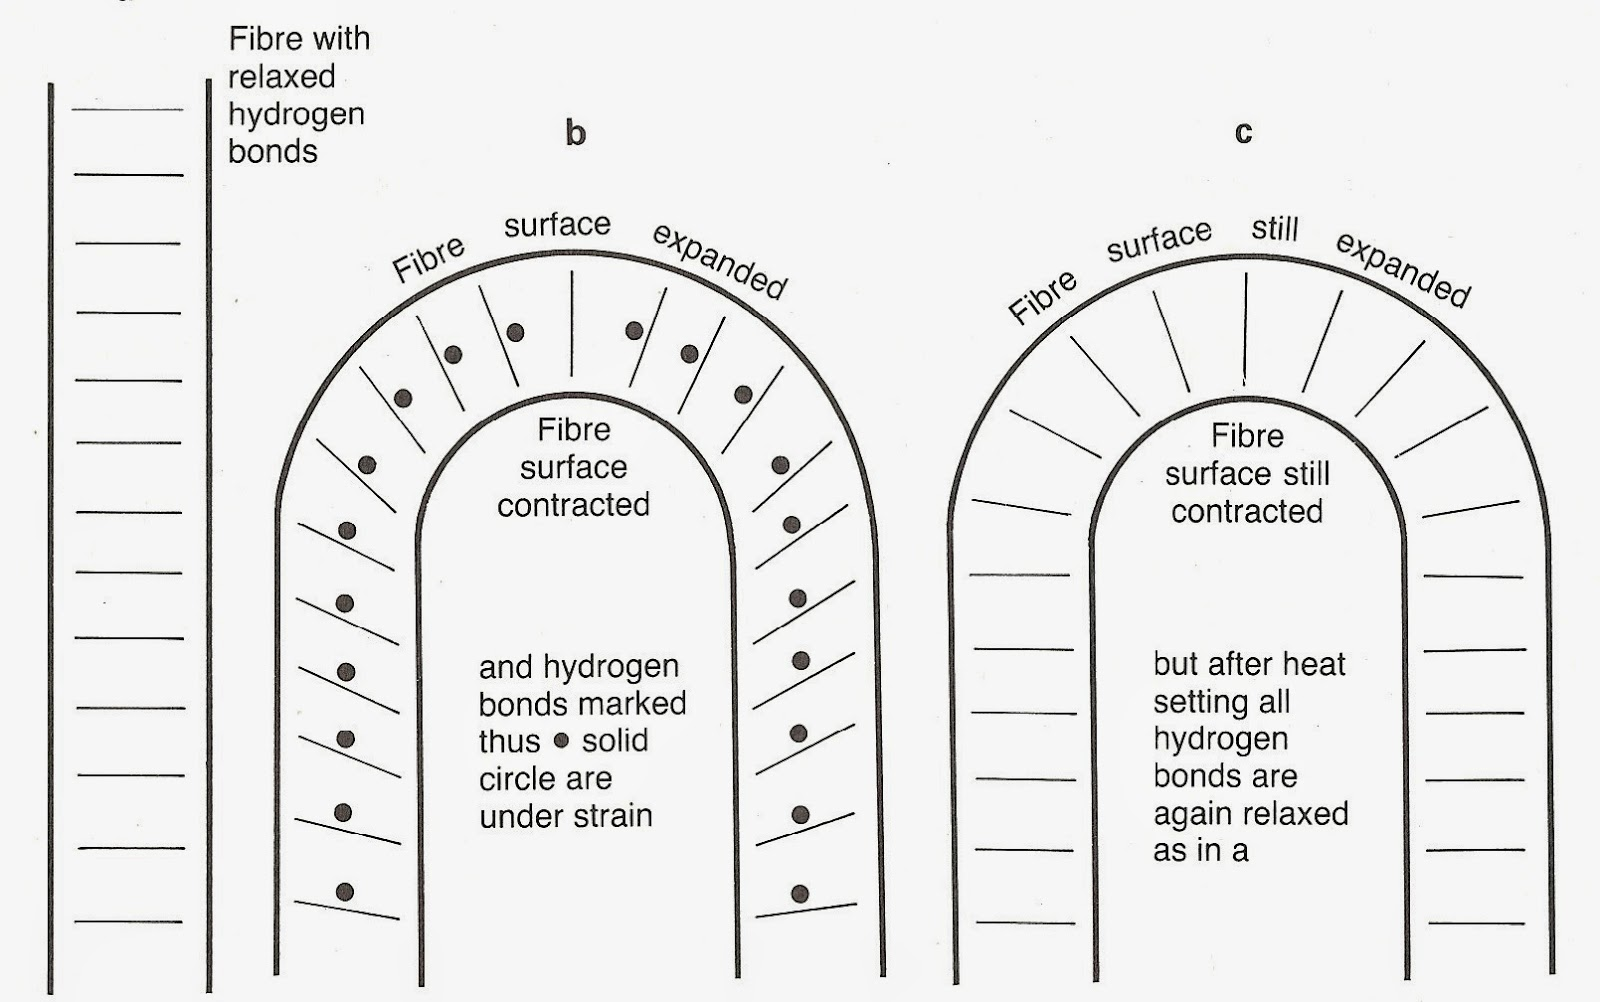 Heat Setting Nylon Fibers Are 54